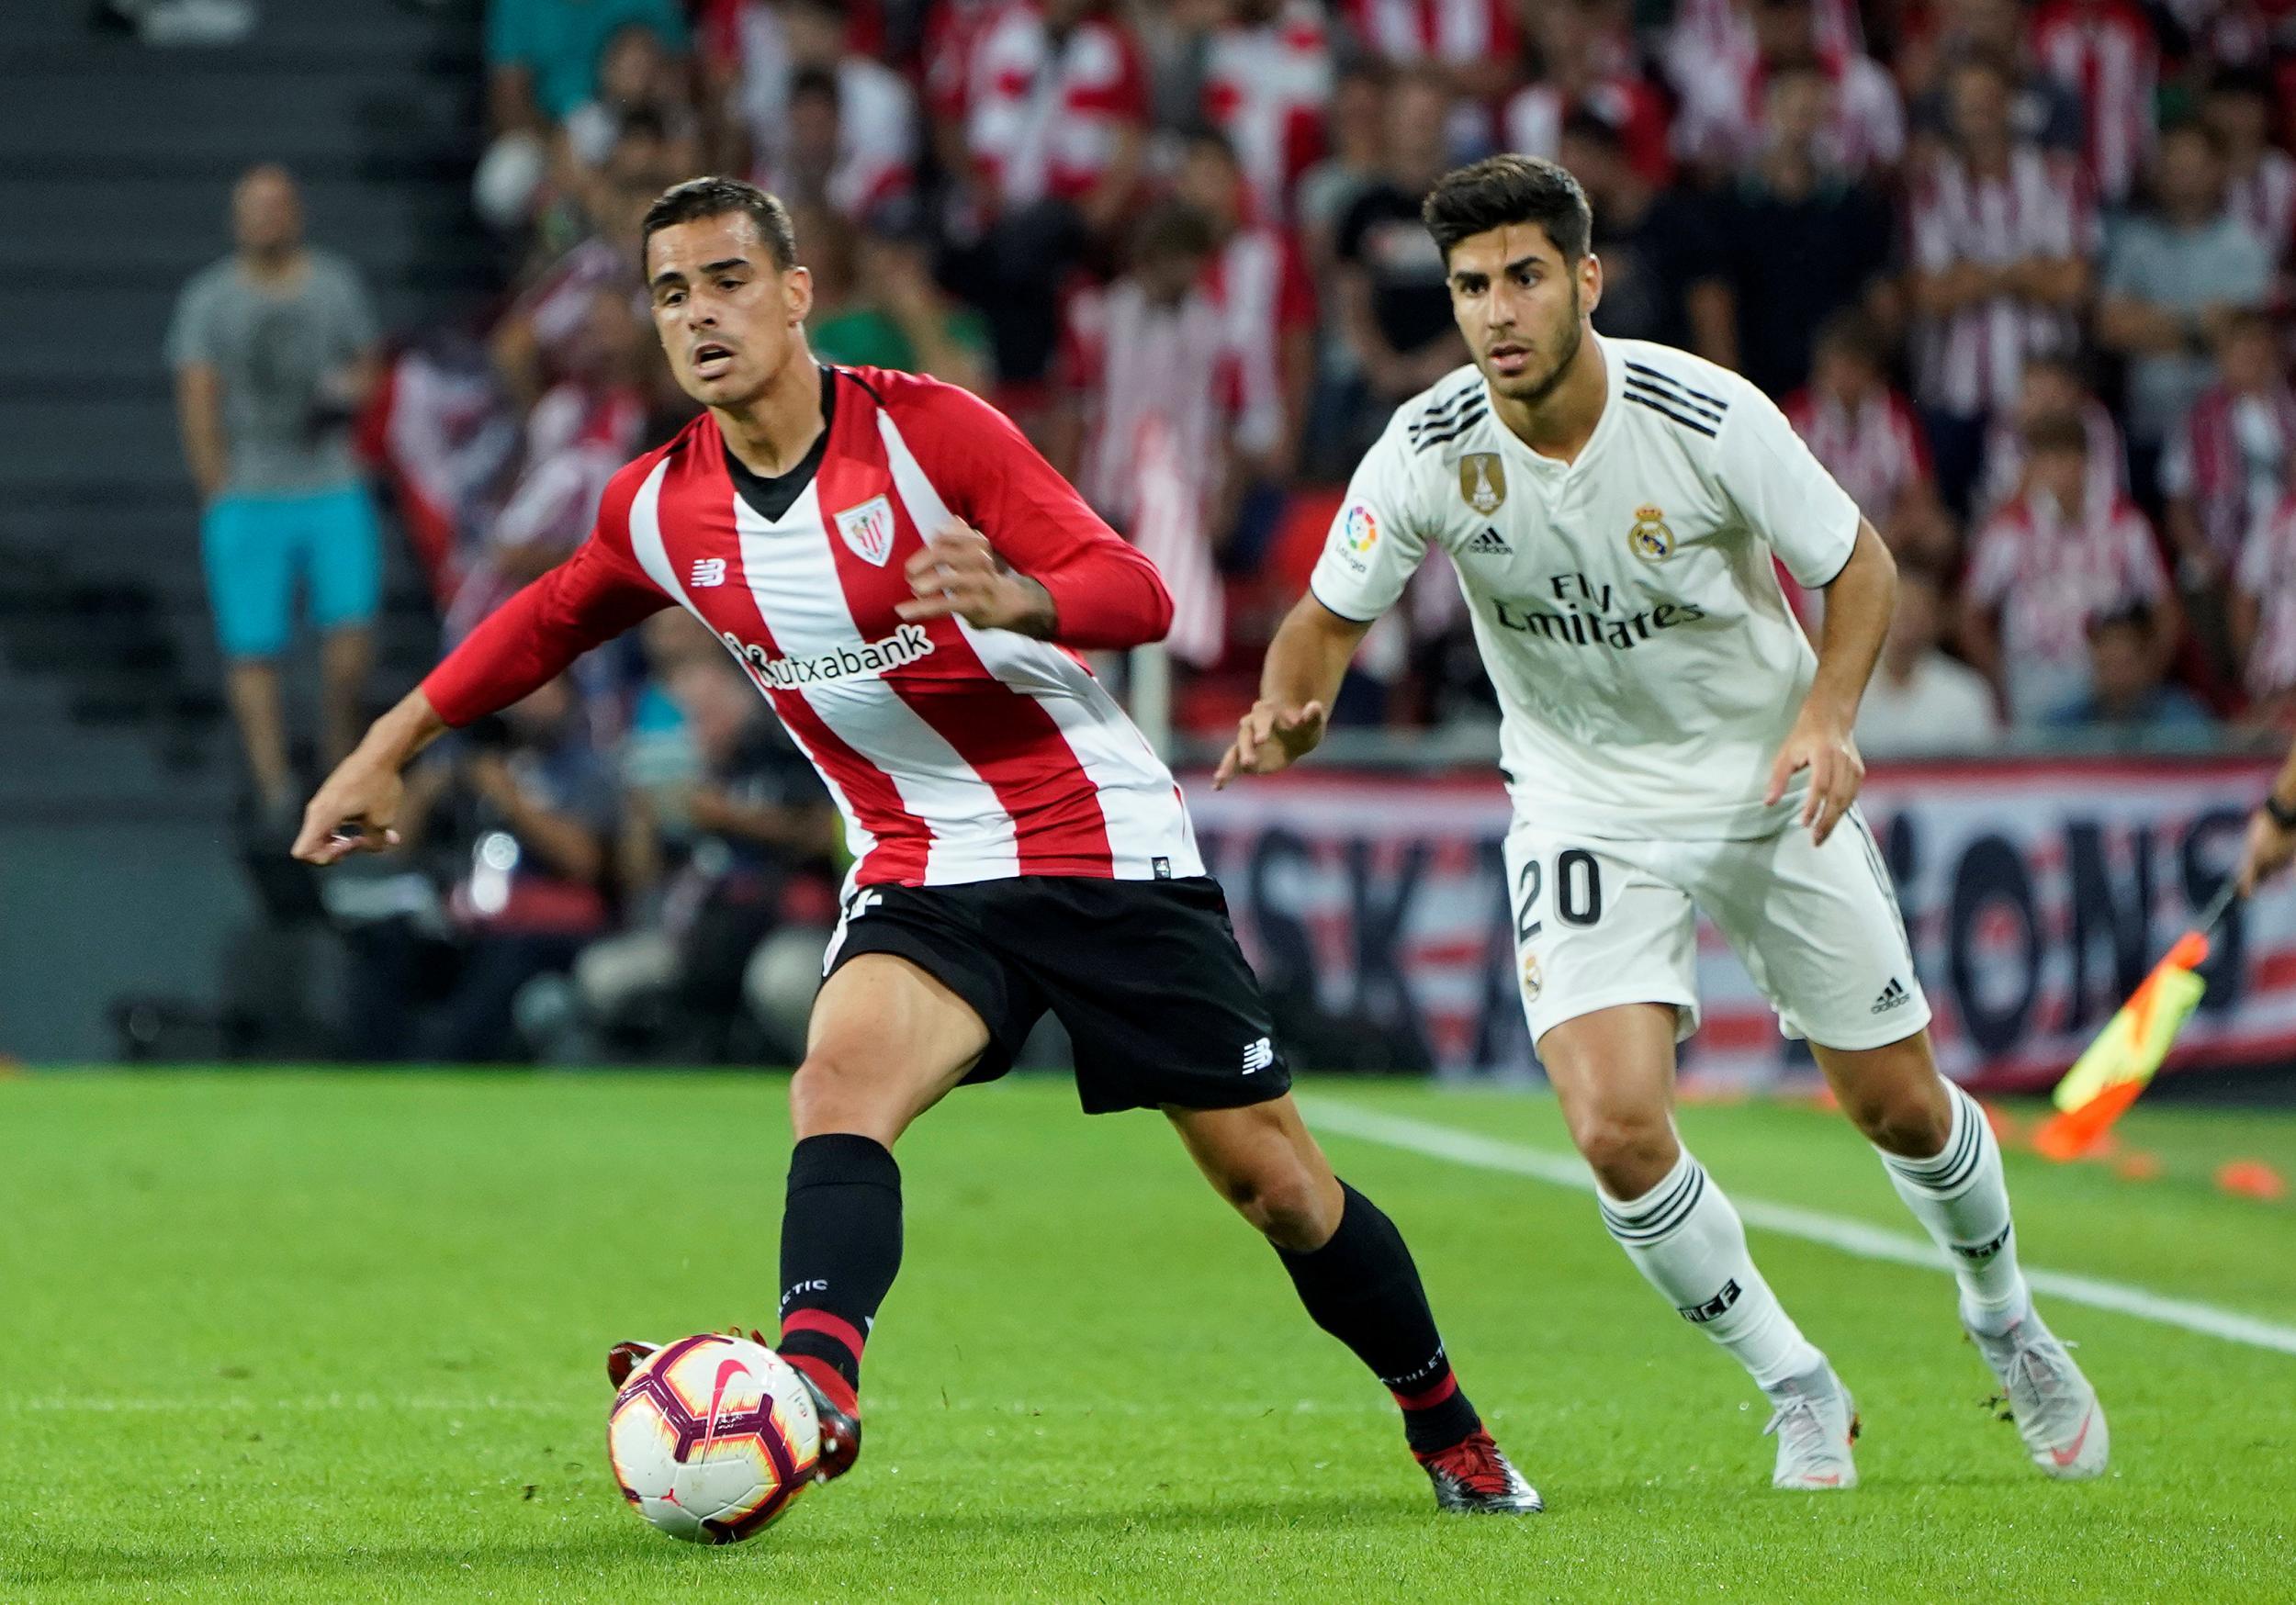 soi-keo-ca-cuoc-bong-da-ngay-21-4-slavia-praha-vs-Athletic Bilbao-cong-pha-phao-dai-b9 2